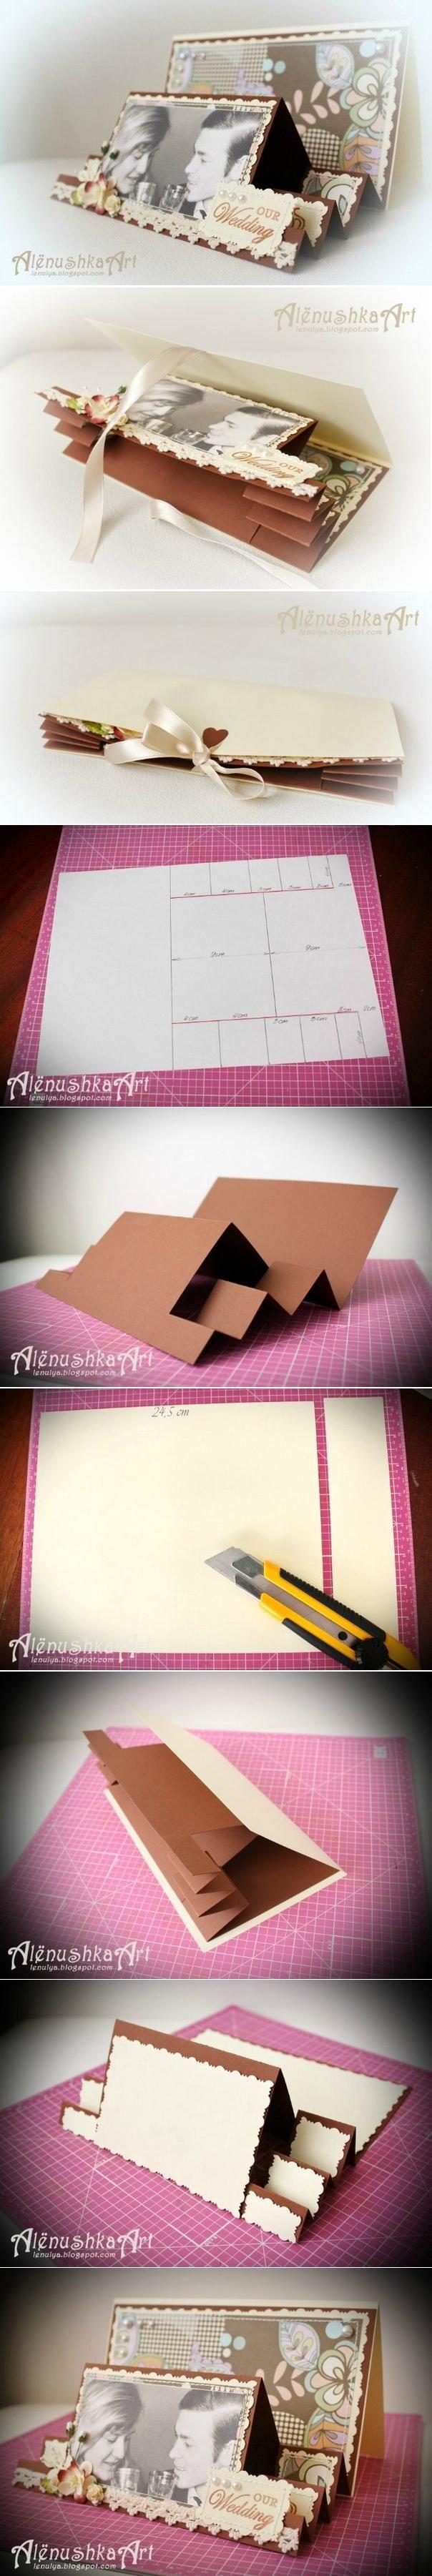 DIY 3D Wedding Card DIY Projects | UsefulDIY.com Follow Us on Facebook ==> http://www.facebook.com/UsefulDiy